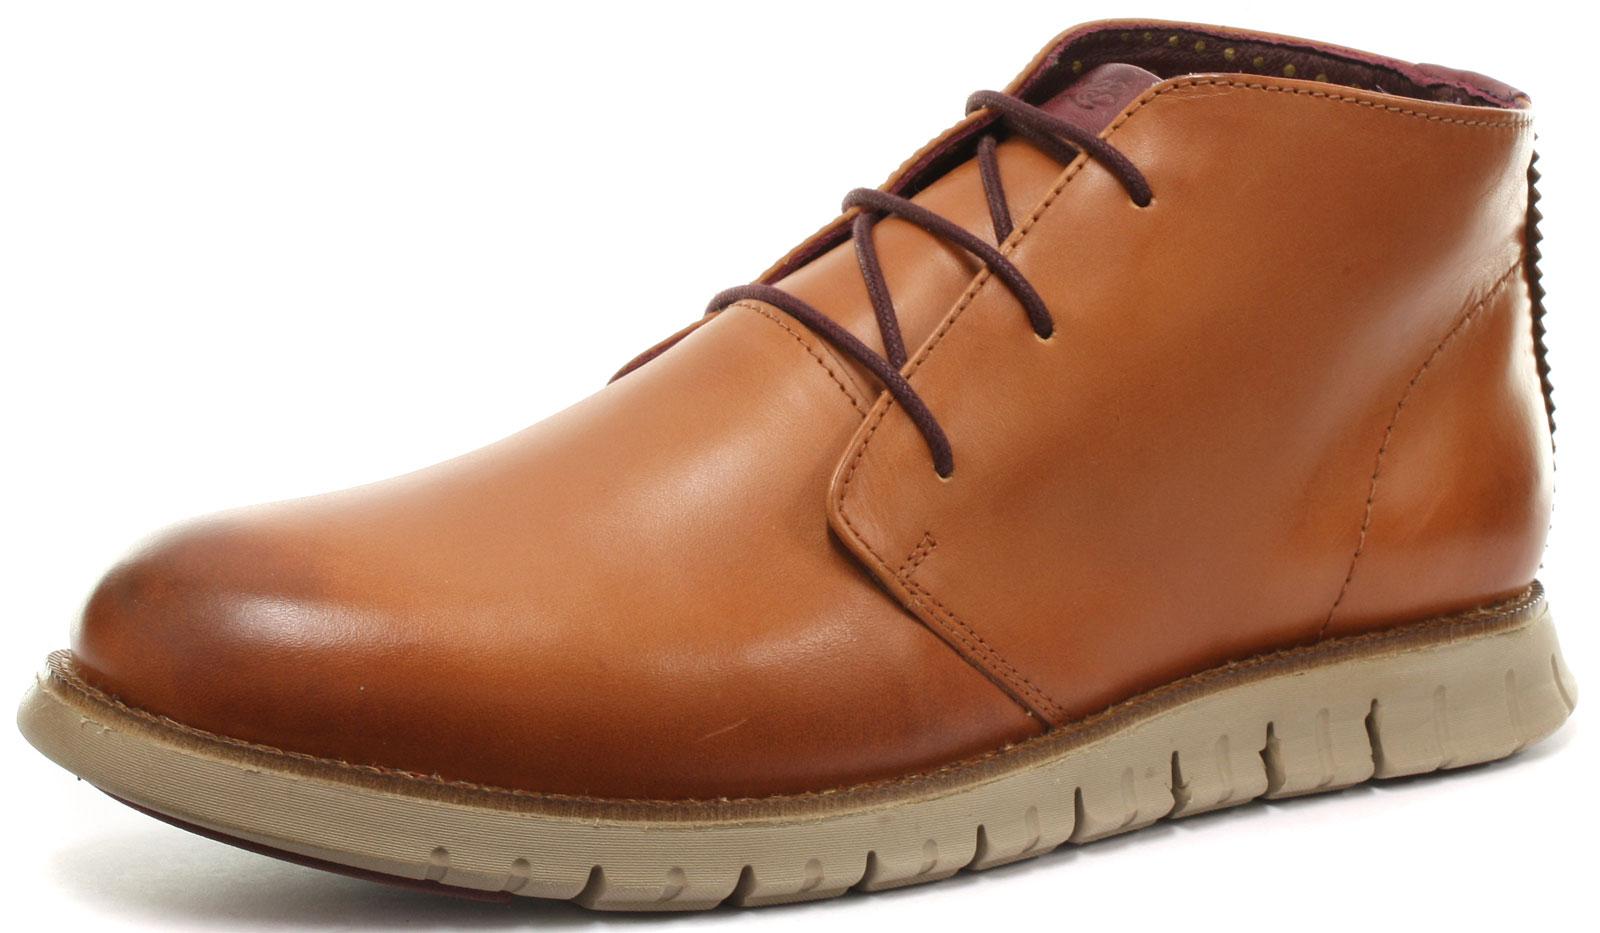 London Brogues Gatz Hi Tan Leather Mens Chukka Ankle Boots Size UK 12 (EU 46)